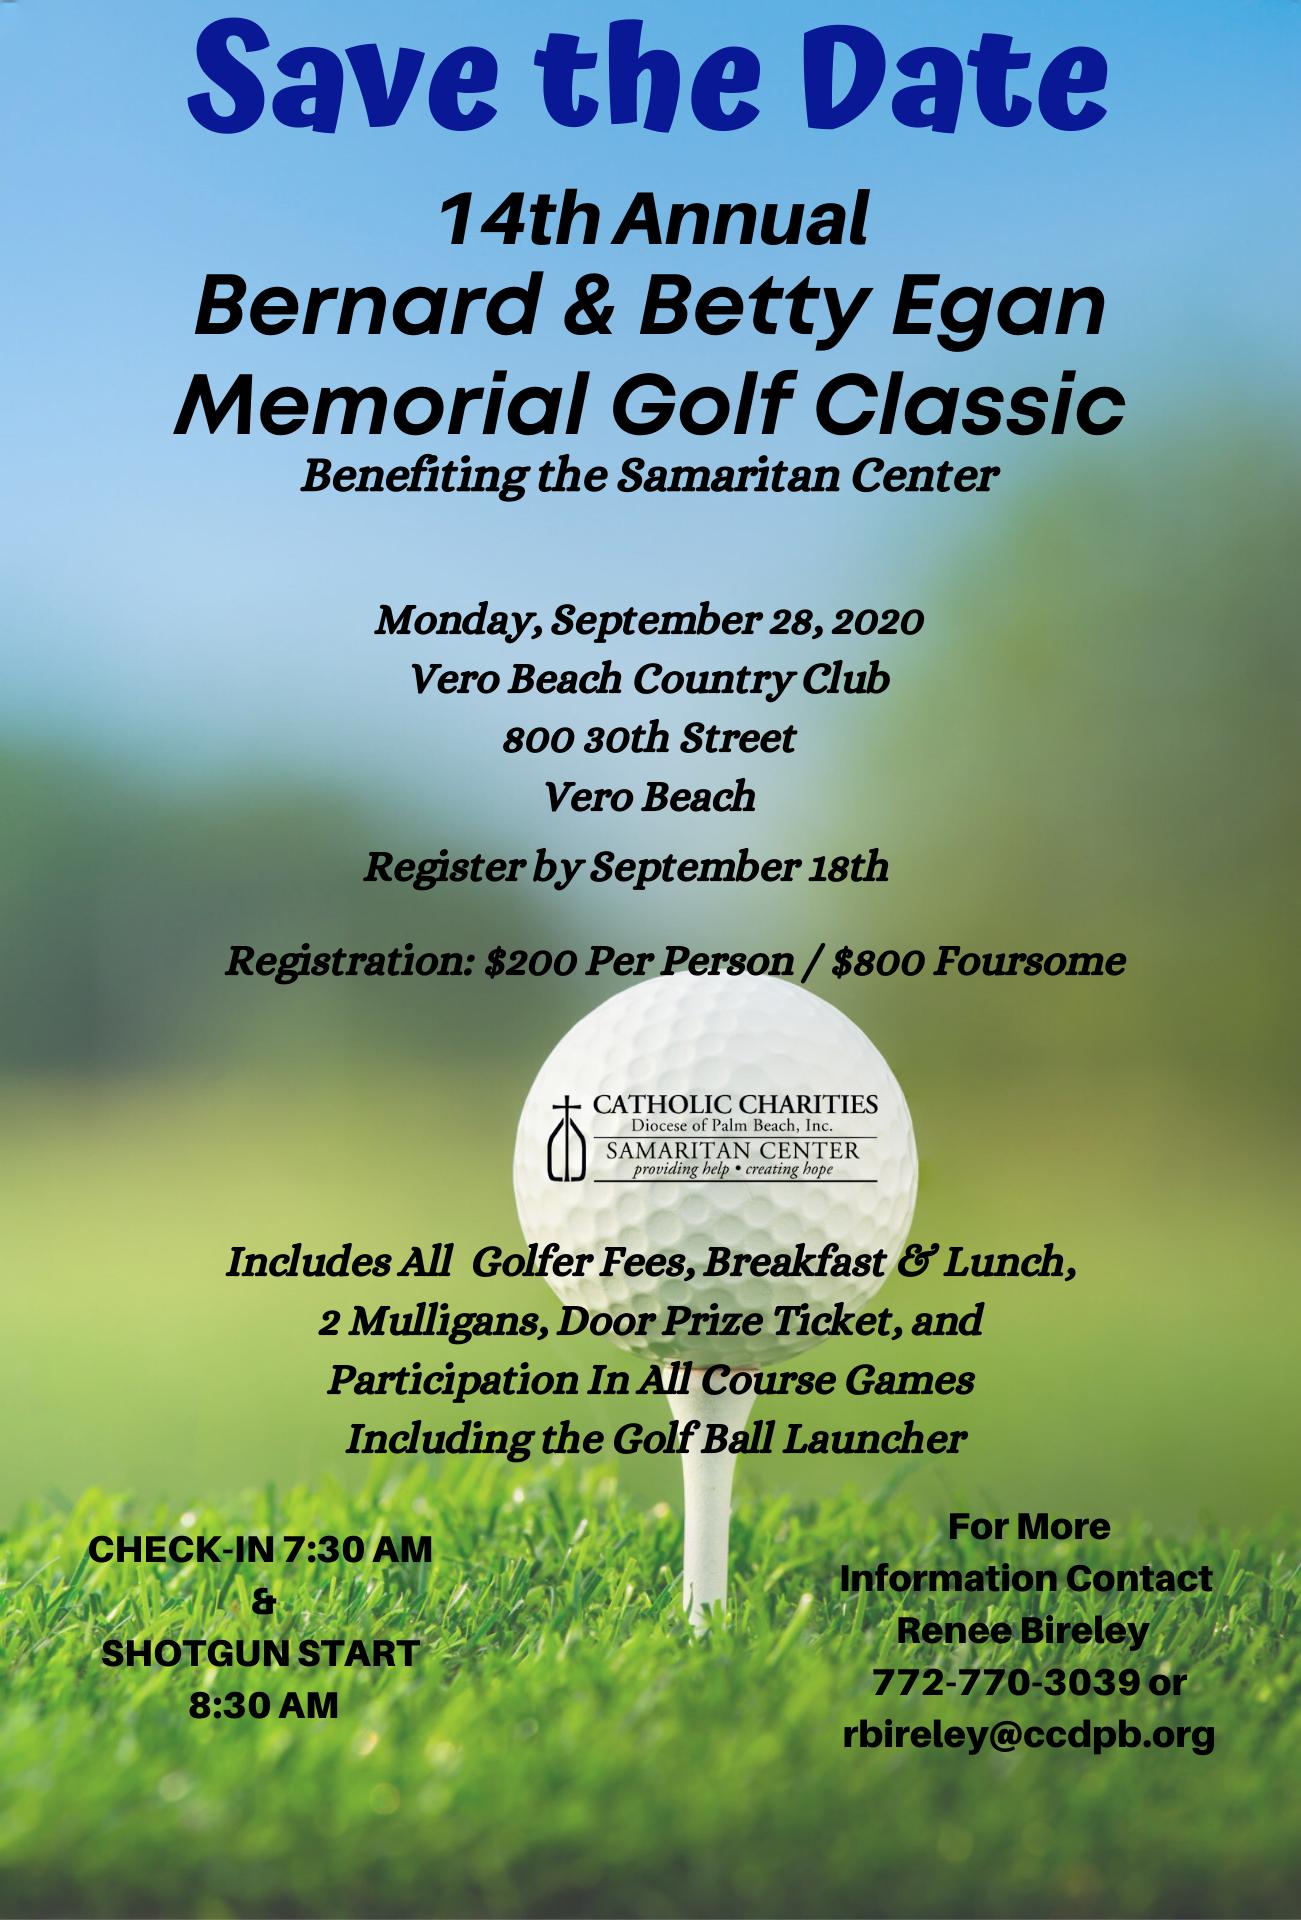 14th Annual Bernard and Betty Egan Memorial Golf Classic